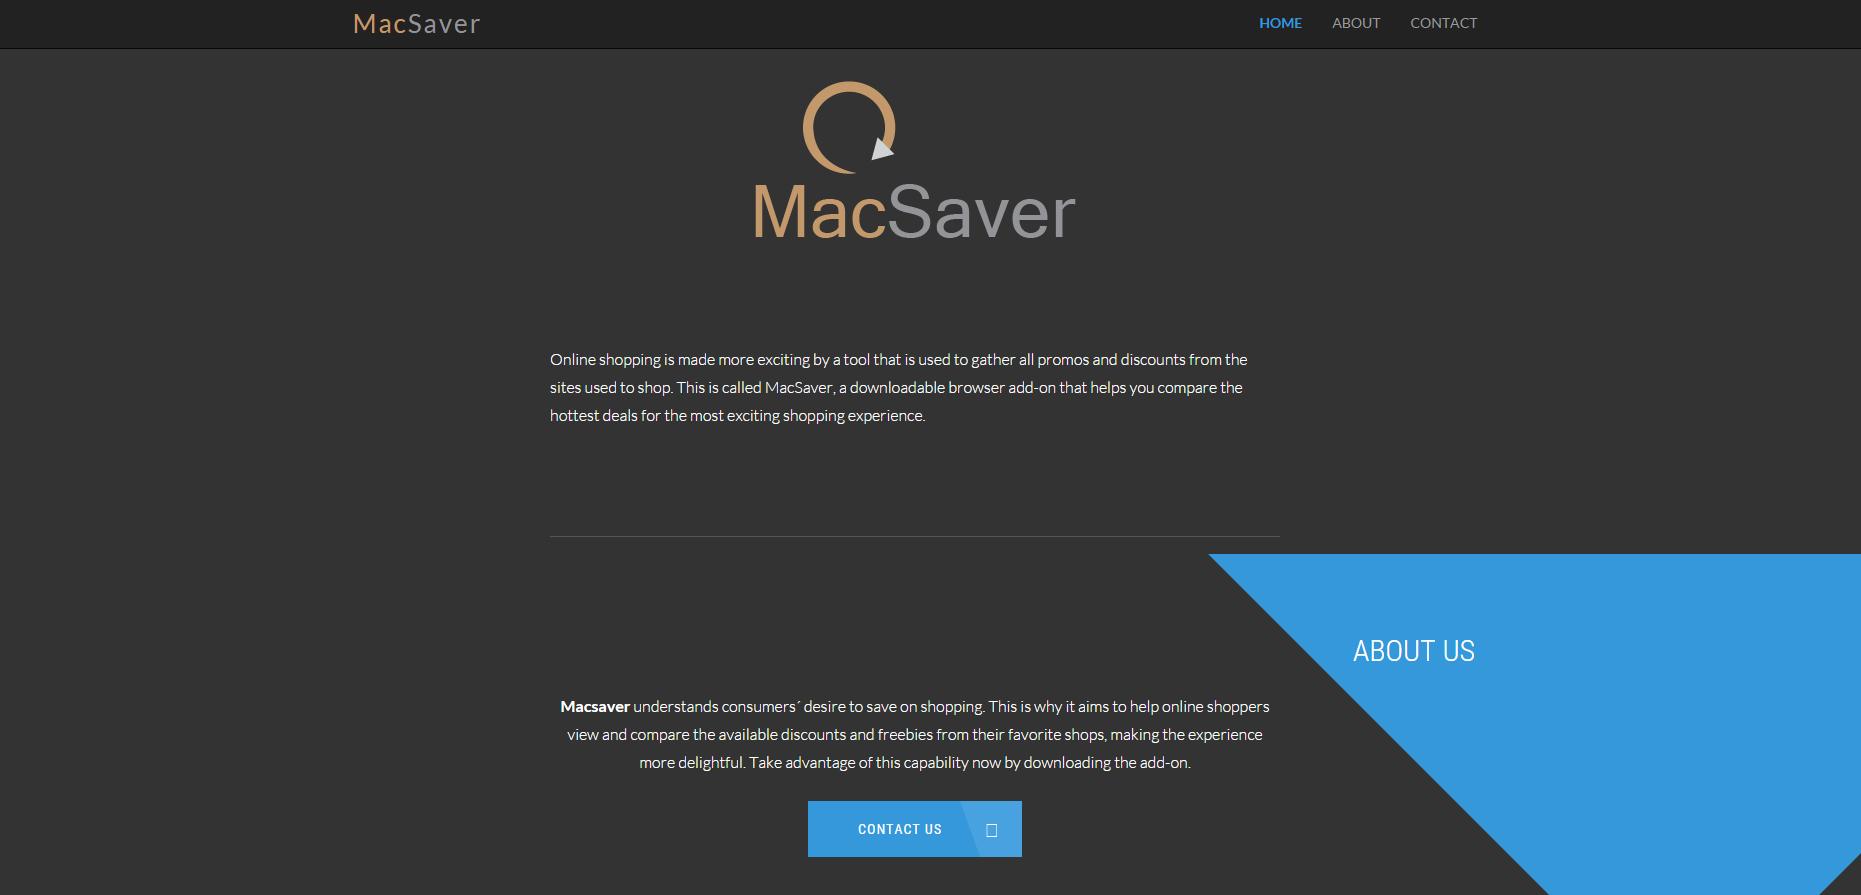 MacSaver ads